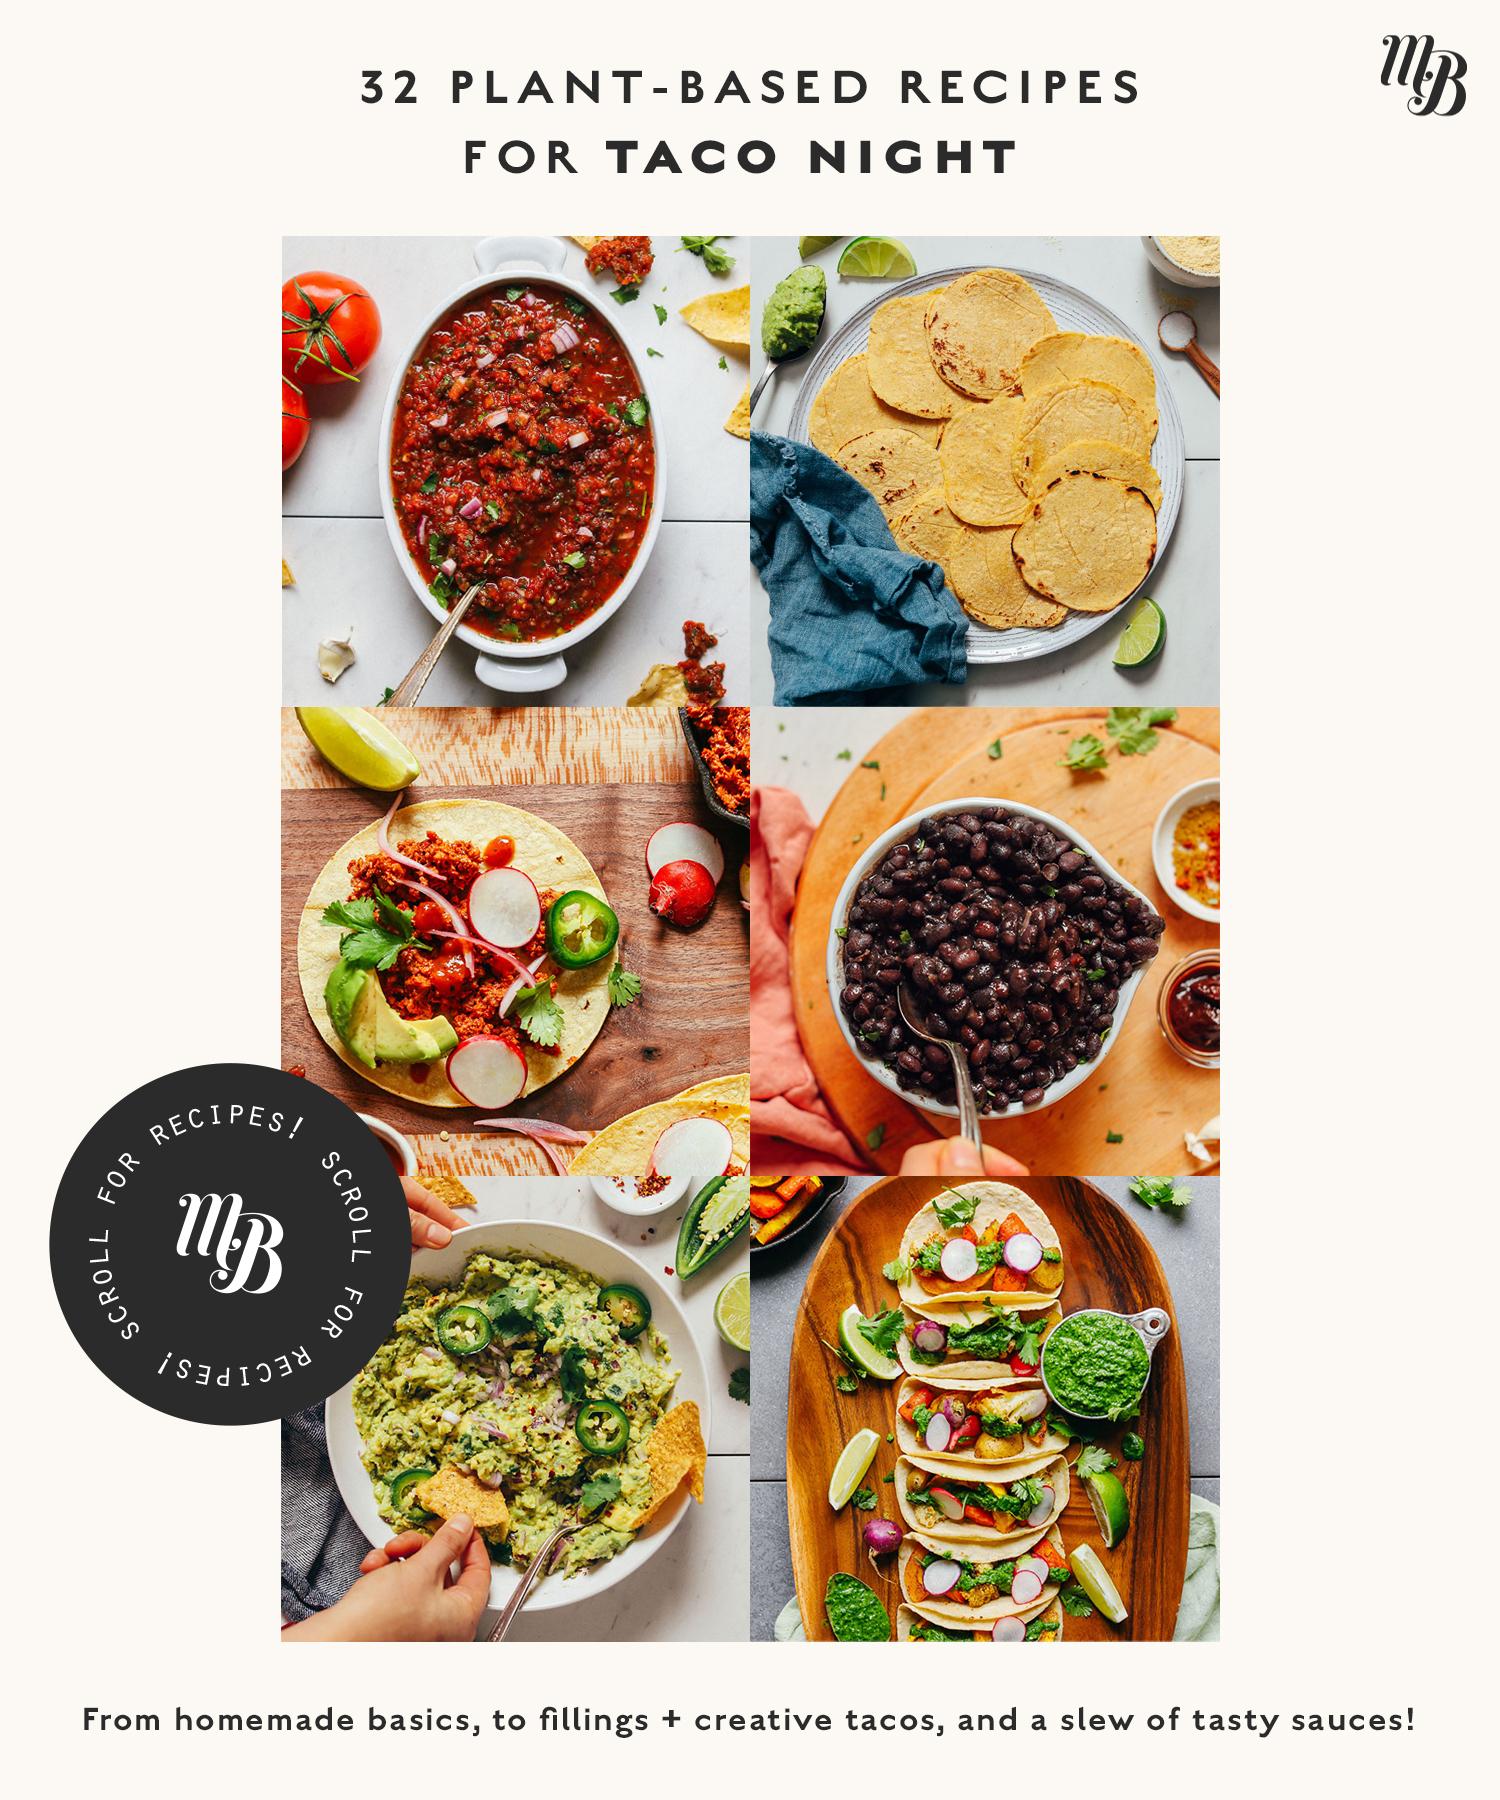 Assortment of recipes for vegan taco night